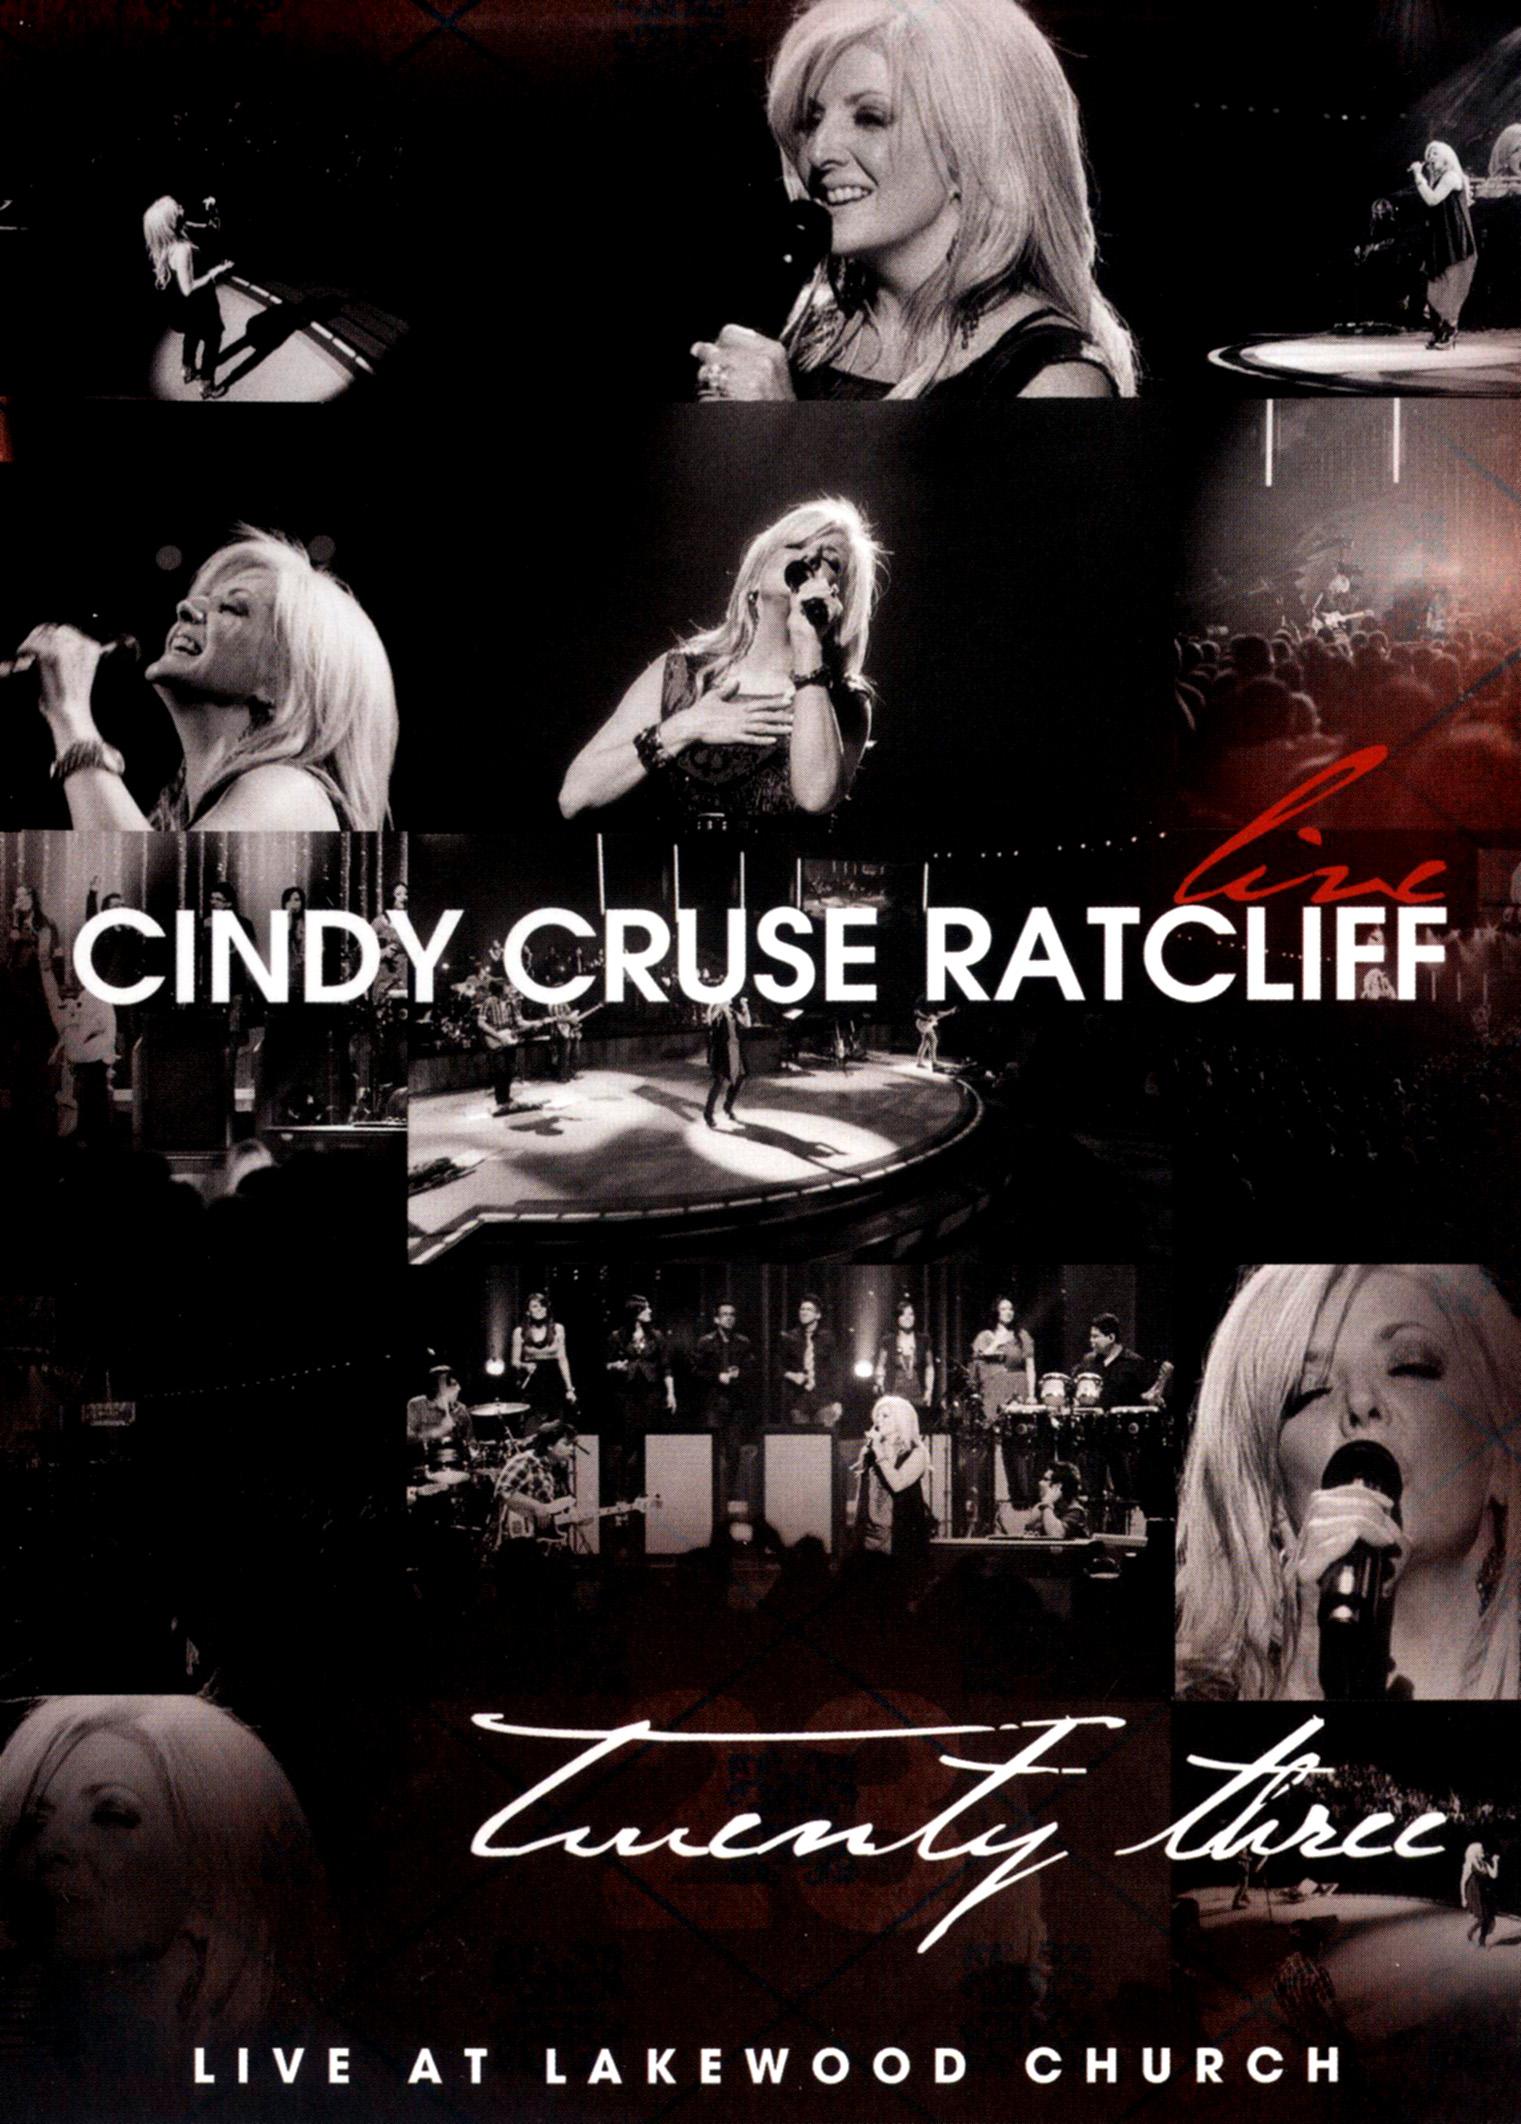 Cindy Cruse Ratcliff: Twenty Three - Live at Lakewood Church